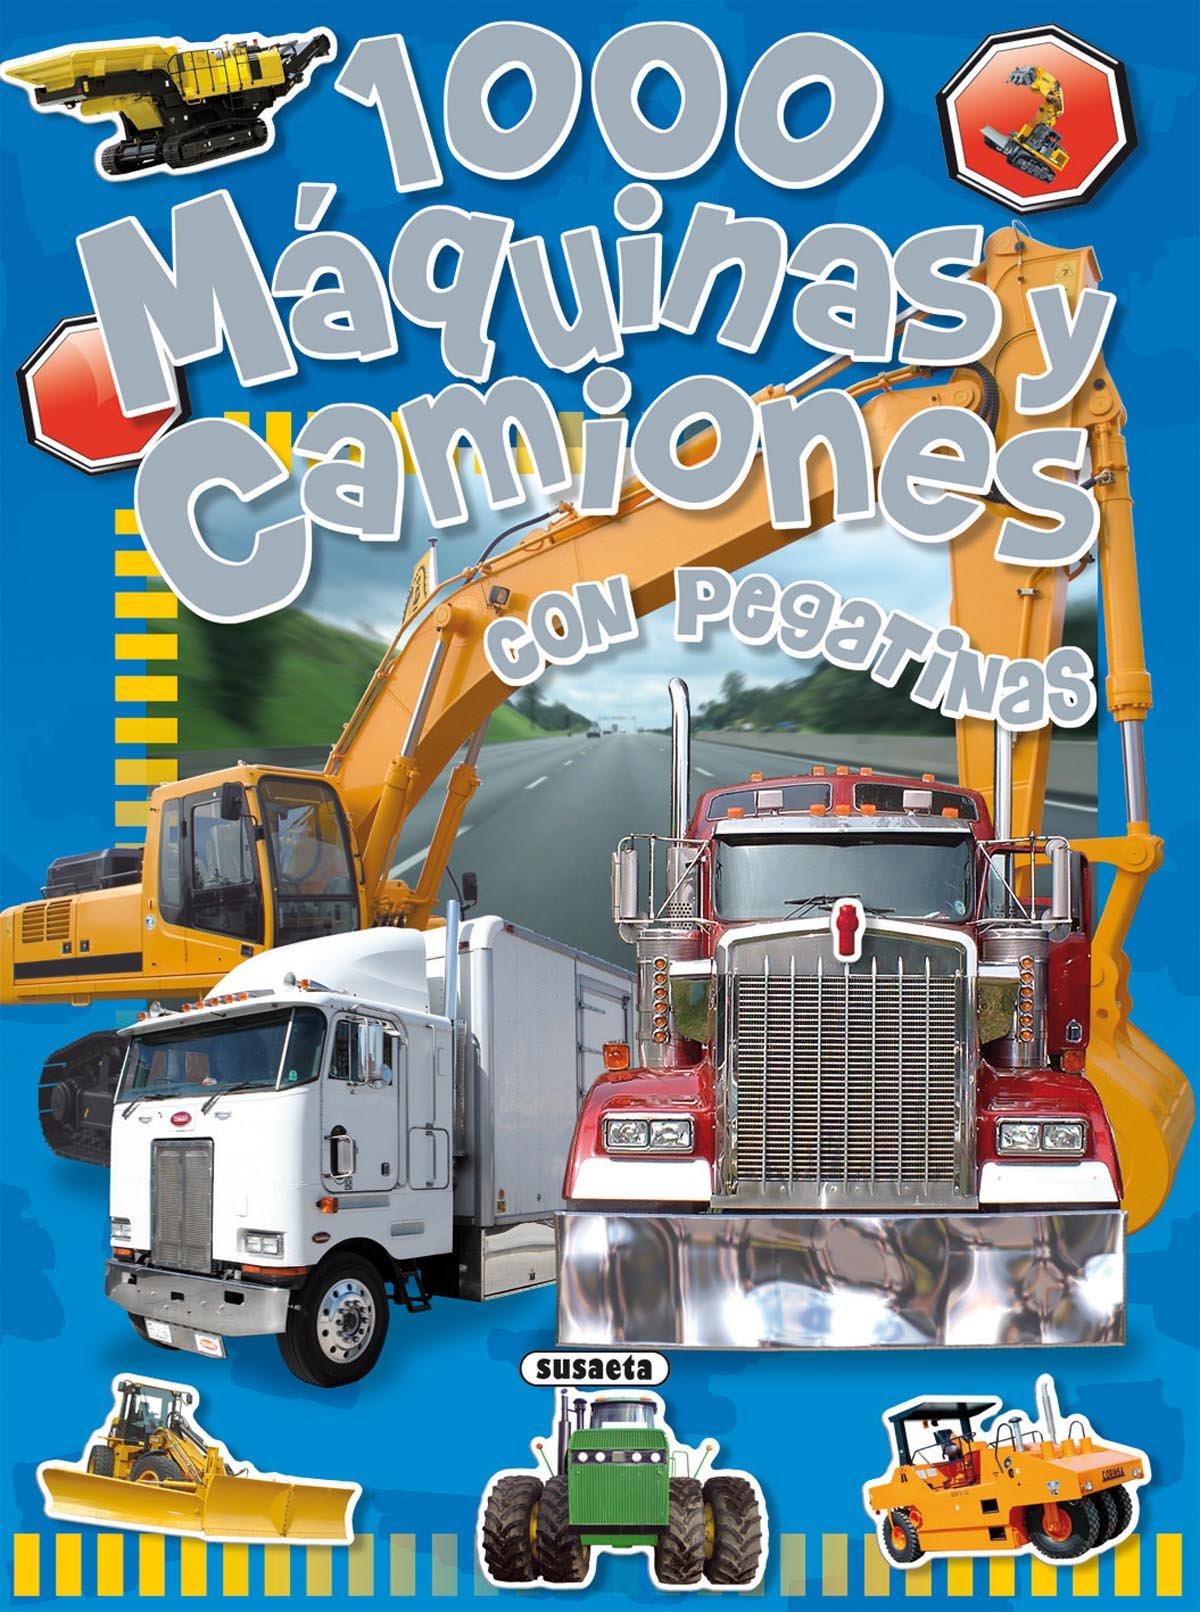 1000 máquinas y camiones: Con pegatinas (Spanish Edition) (Spanish) Paperback – Illustrated, June 1, 2011